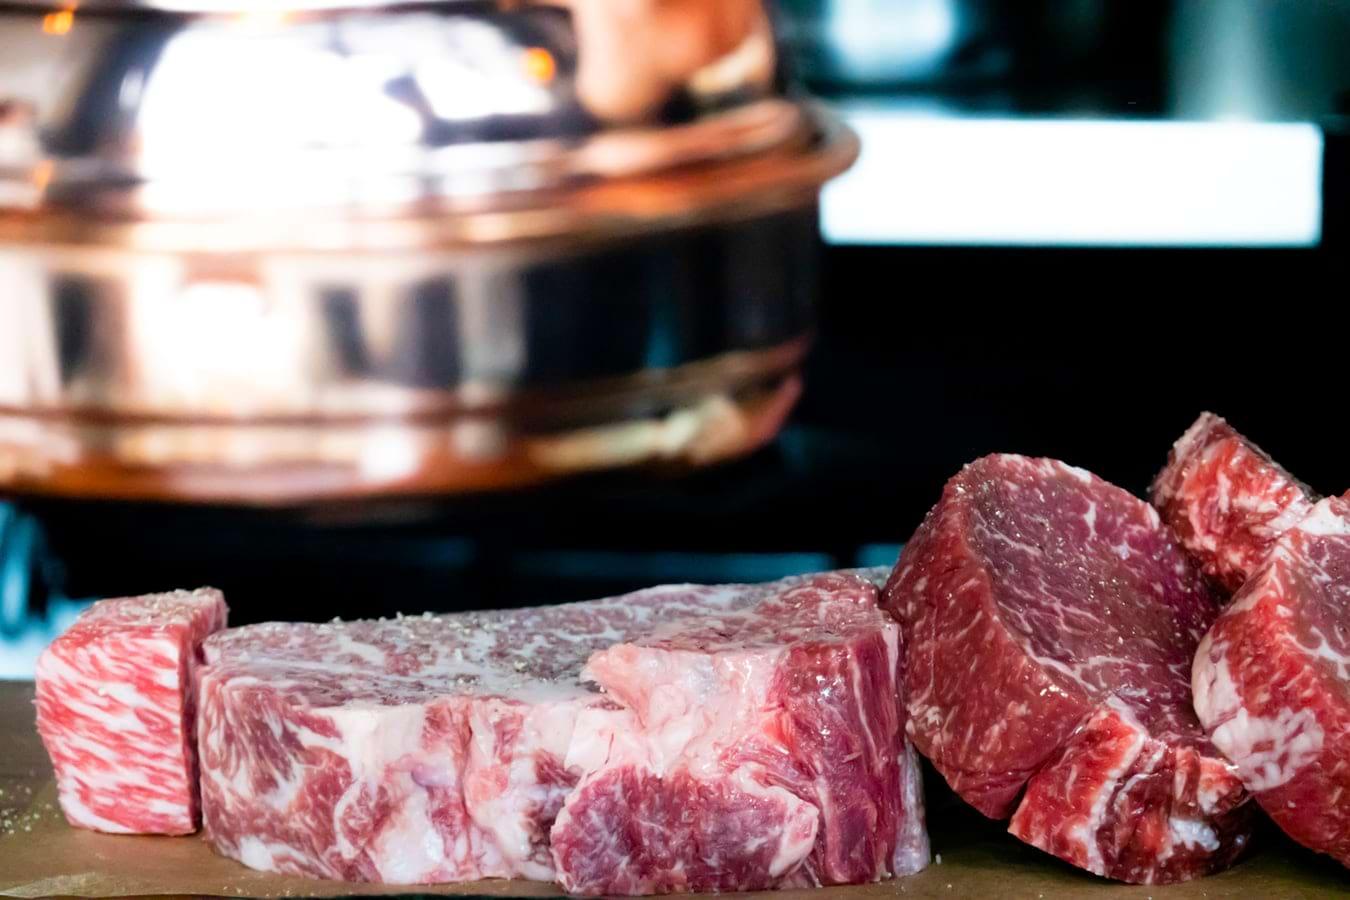 Cum alegi carnea din comerț